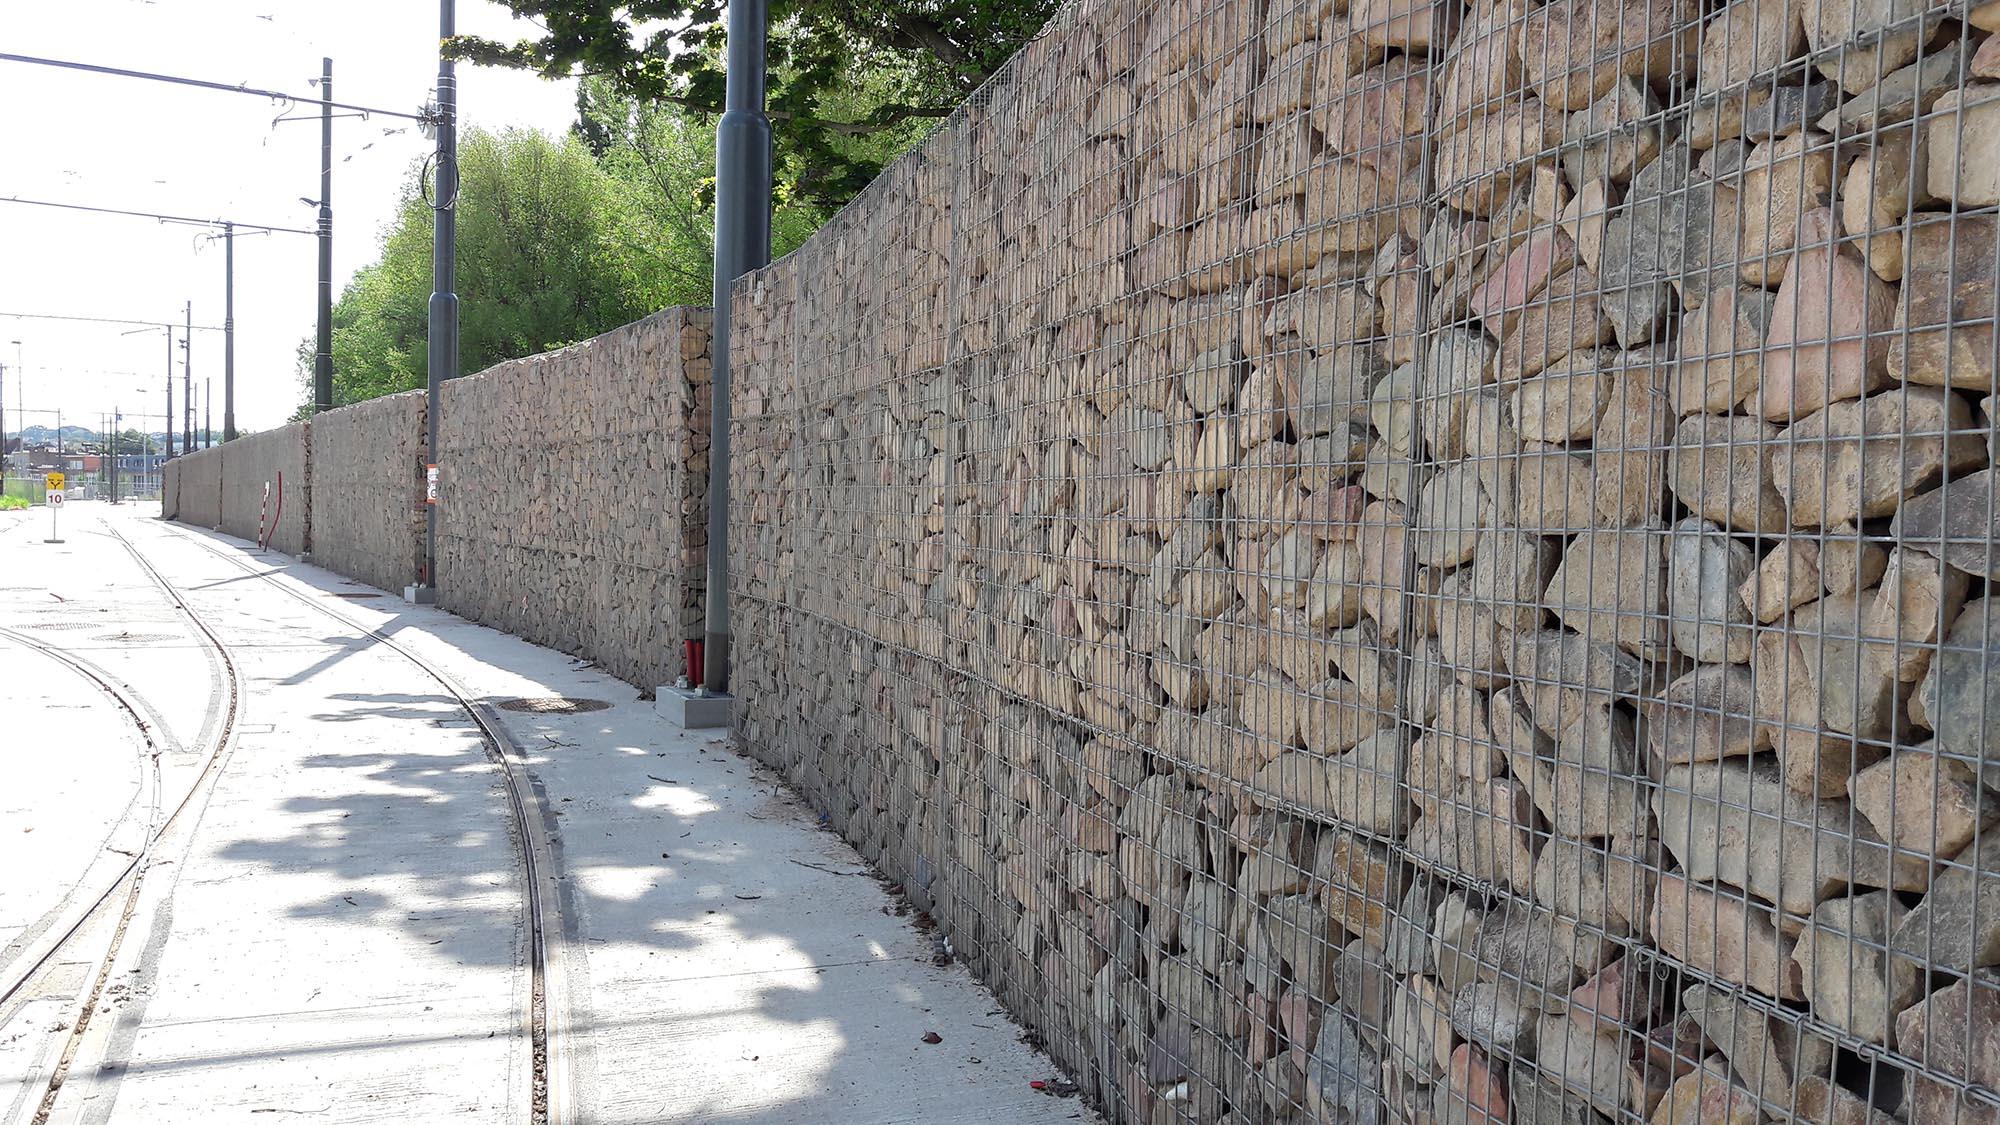 mur-antibruit-antigeluidsmuur